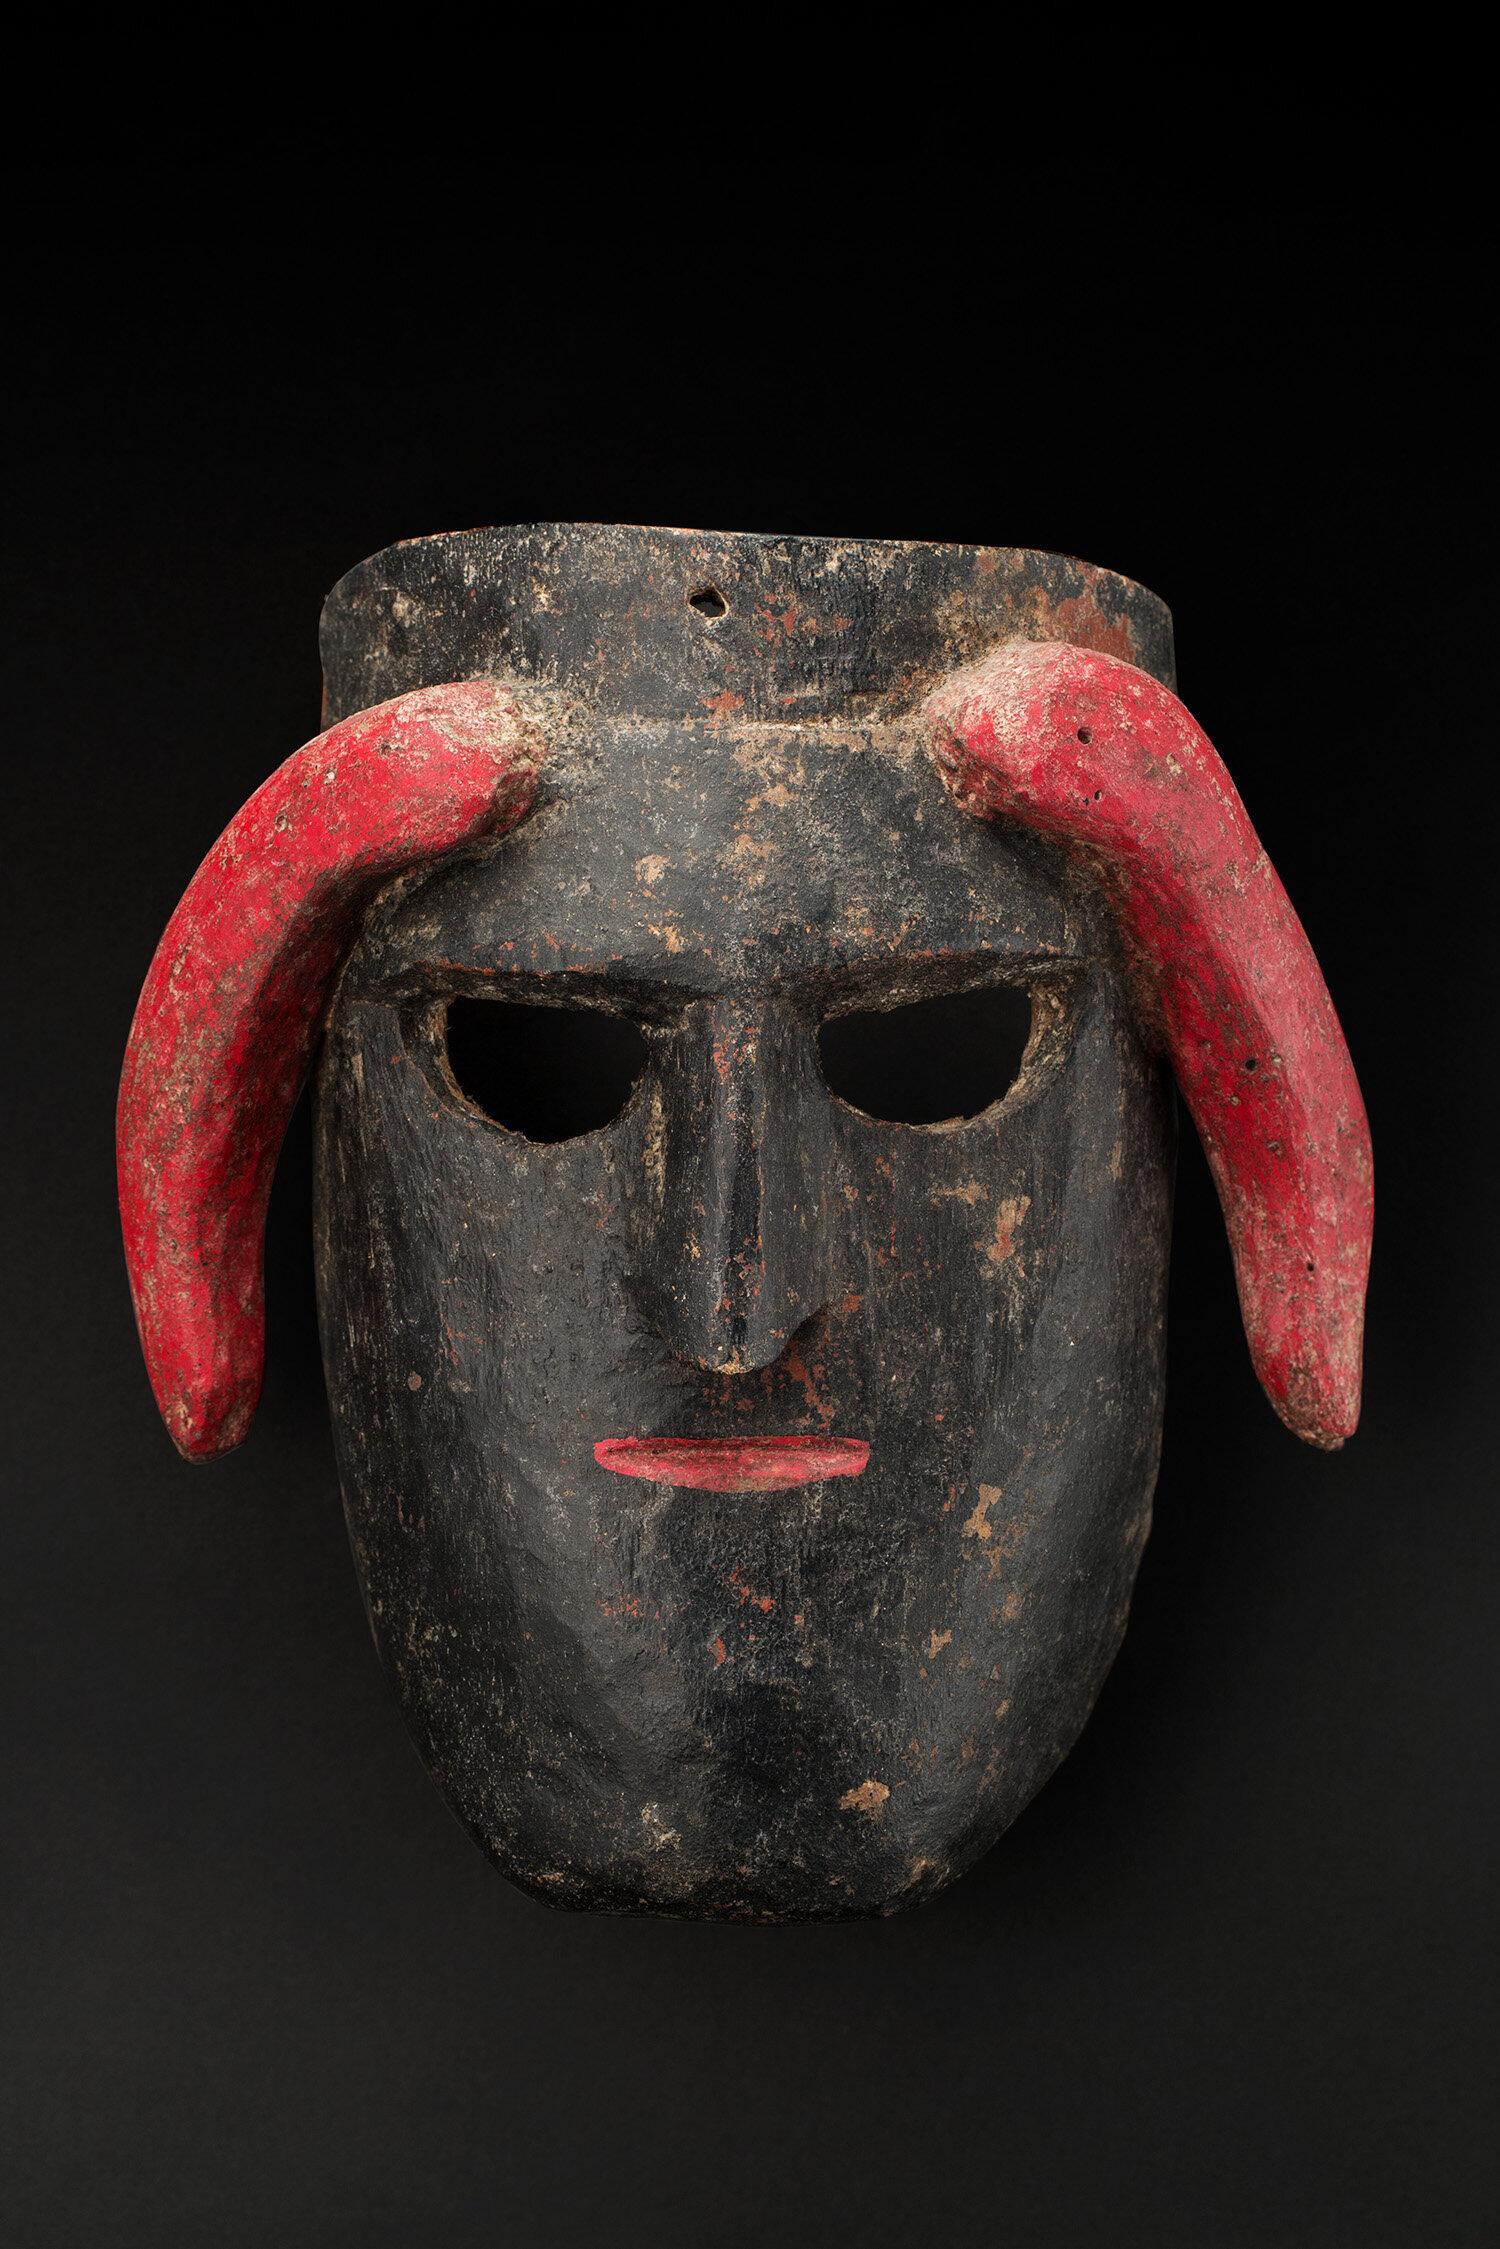 Masks  Guerrero Diablo character, Diablito Dance  , mid 20th C. Polychrome wood 9.5 x 8.75 x 4.5 inches 24.1 x 22.2 x 11.4 cm M 361